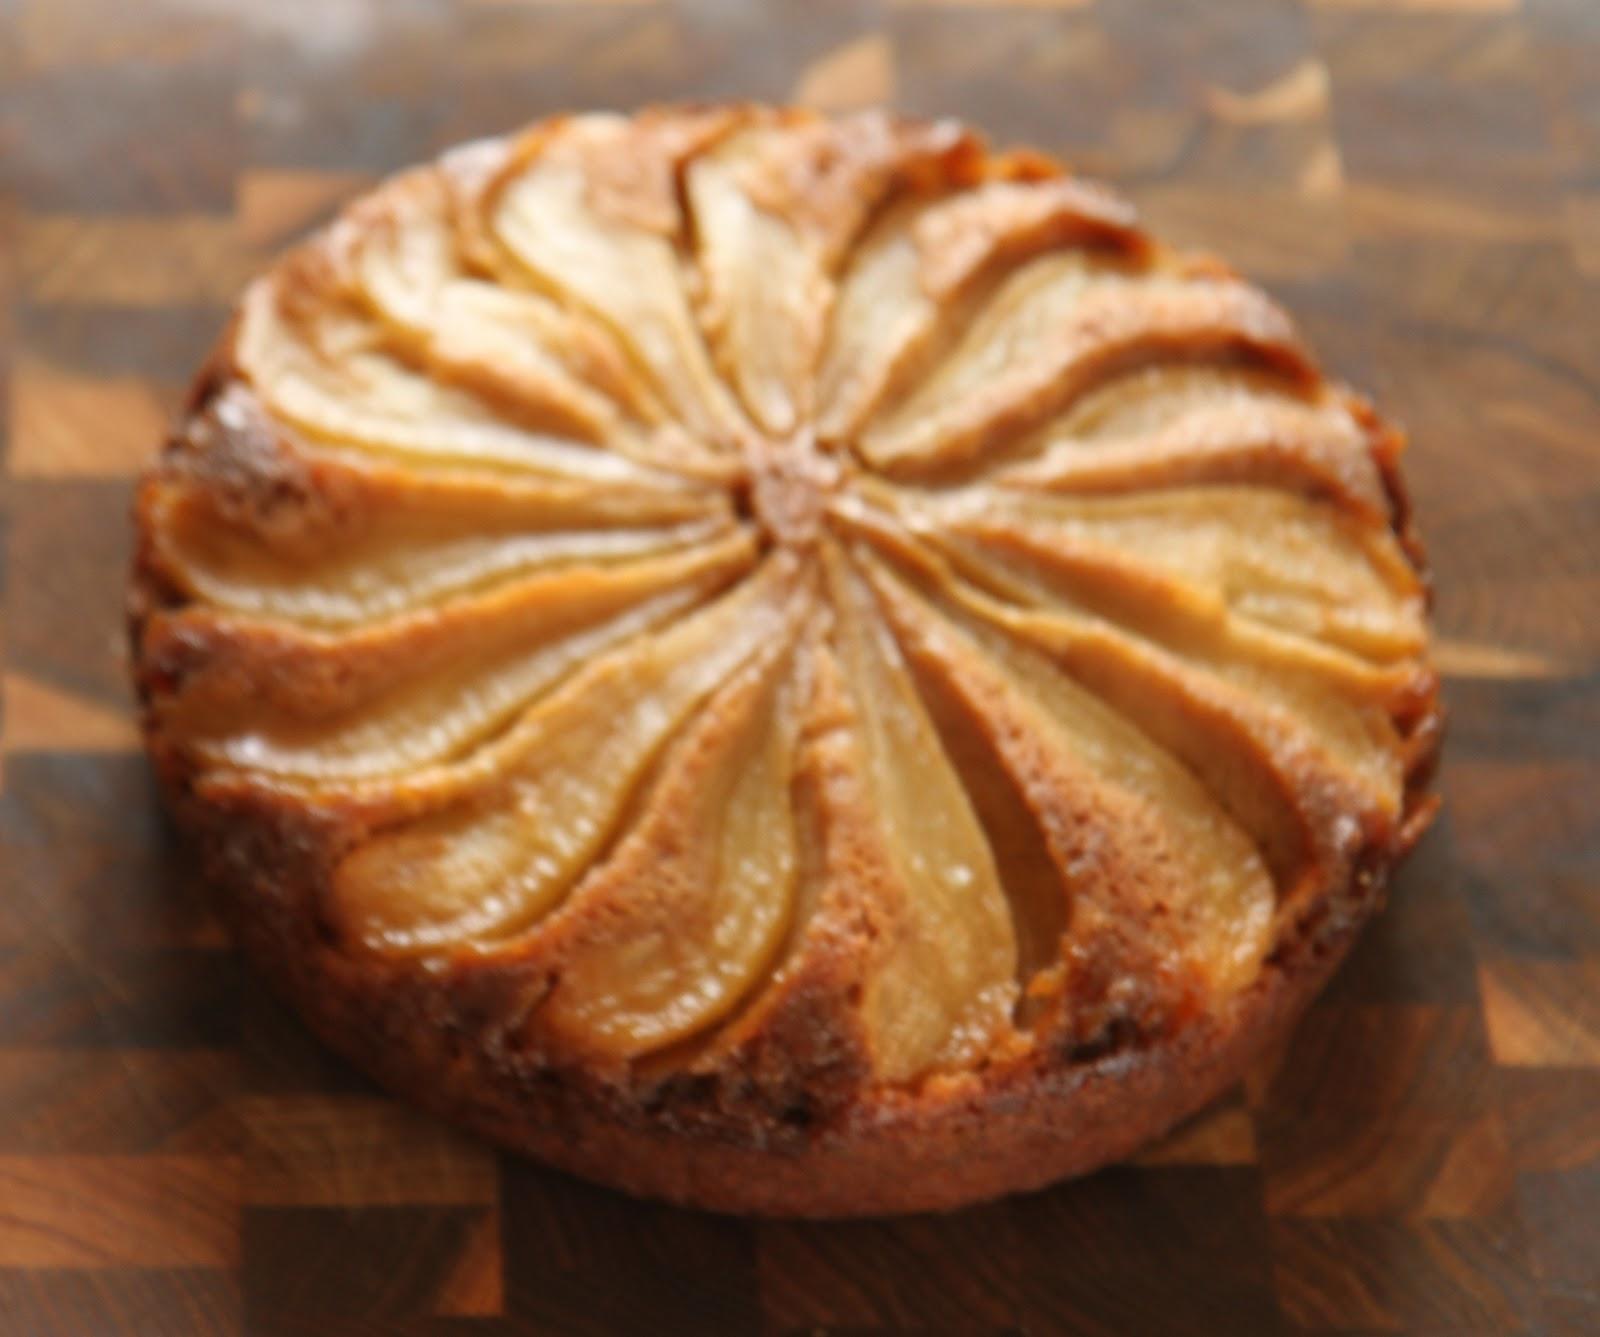 ... upside down cake pineapple upside down cake pear upside down cake